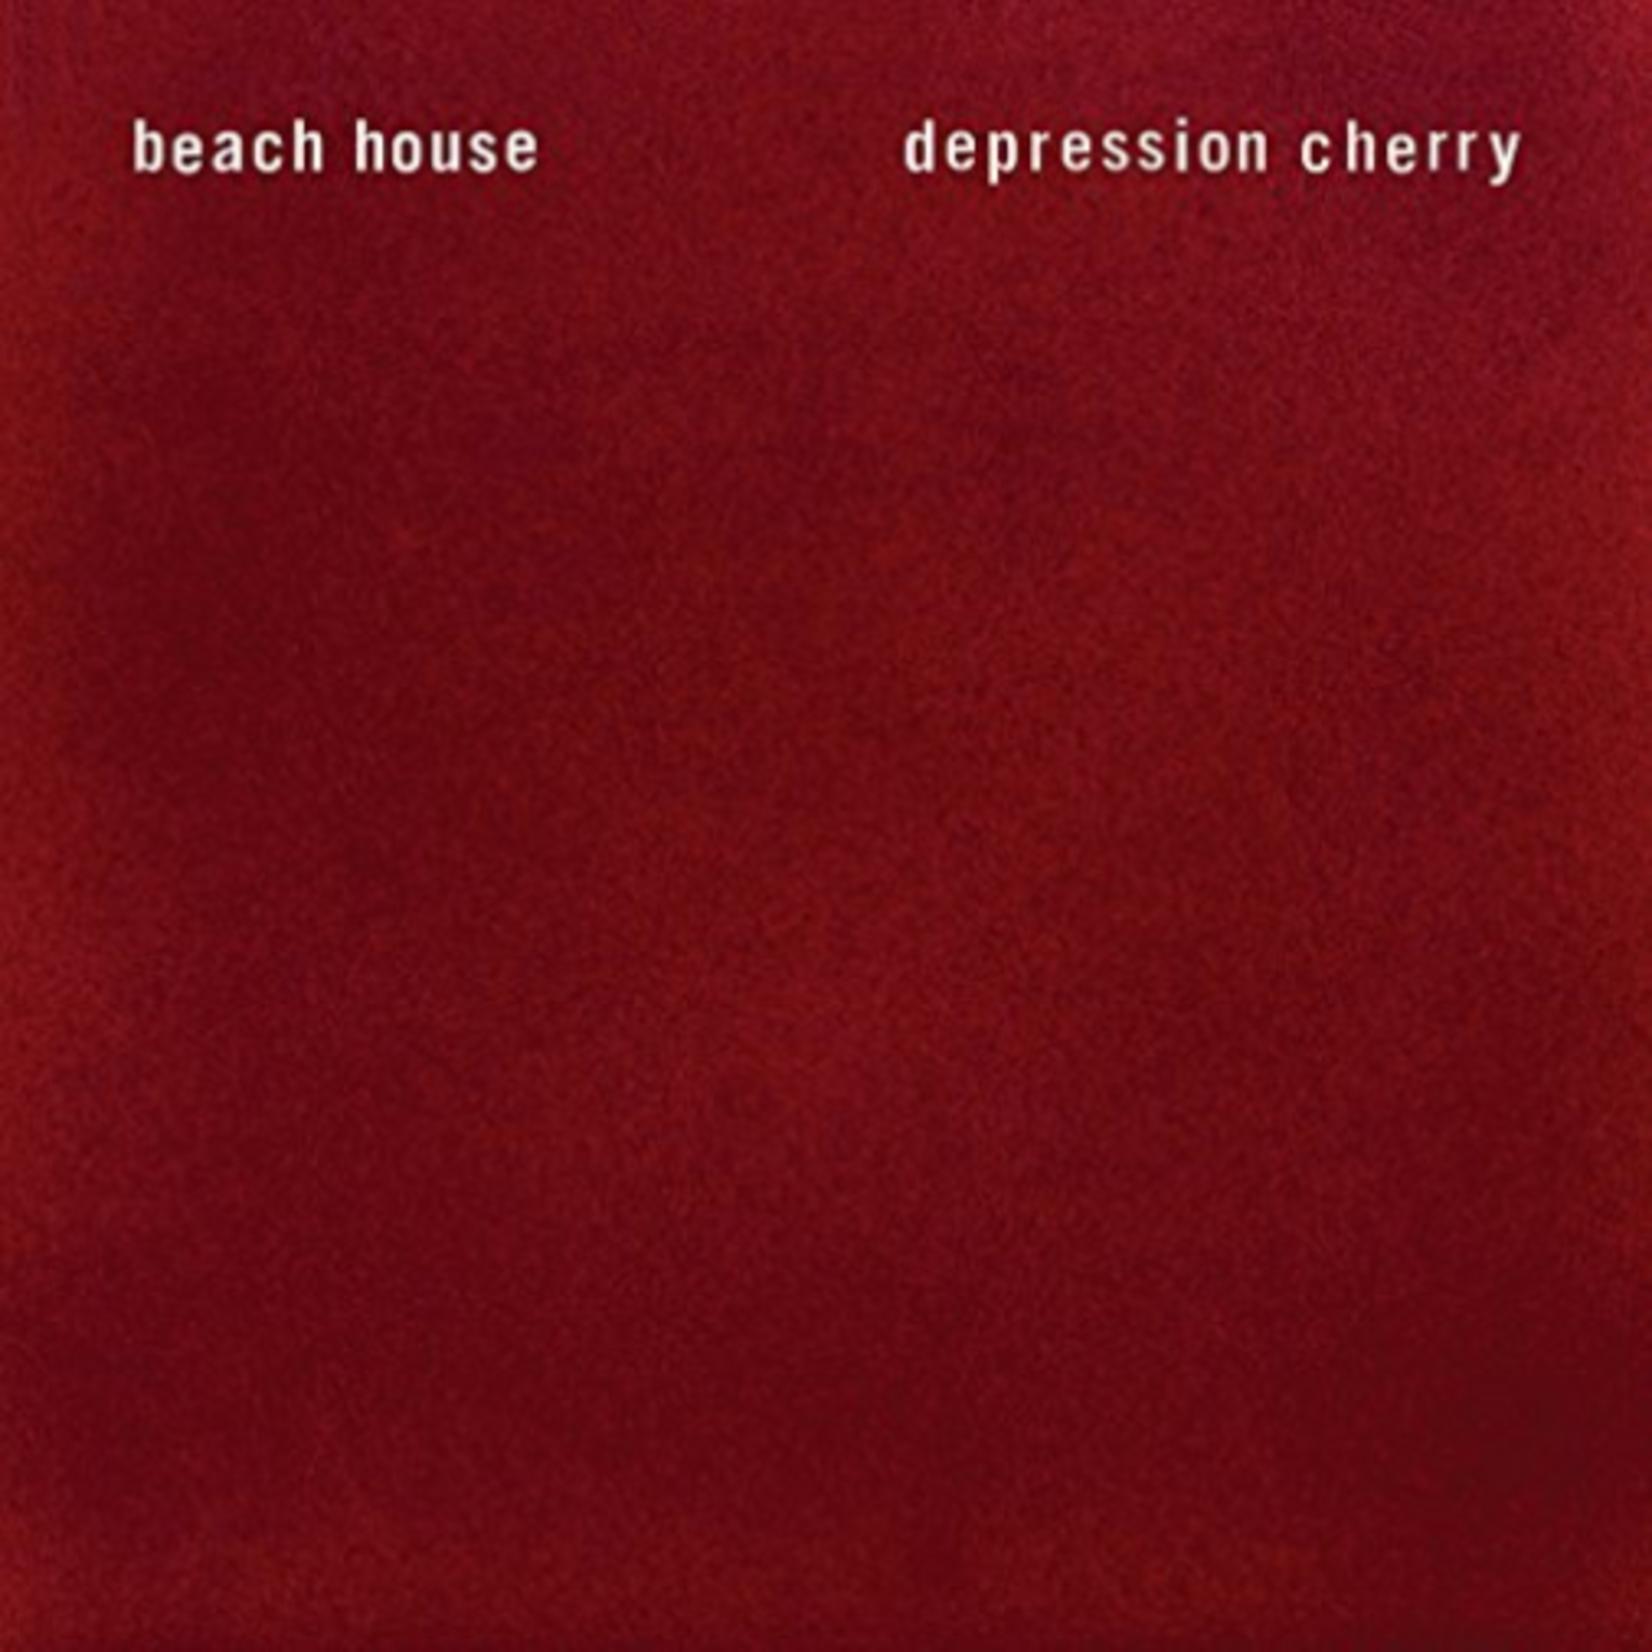 BEACH HOUSE DEPRESSION CHERRY (LP)